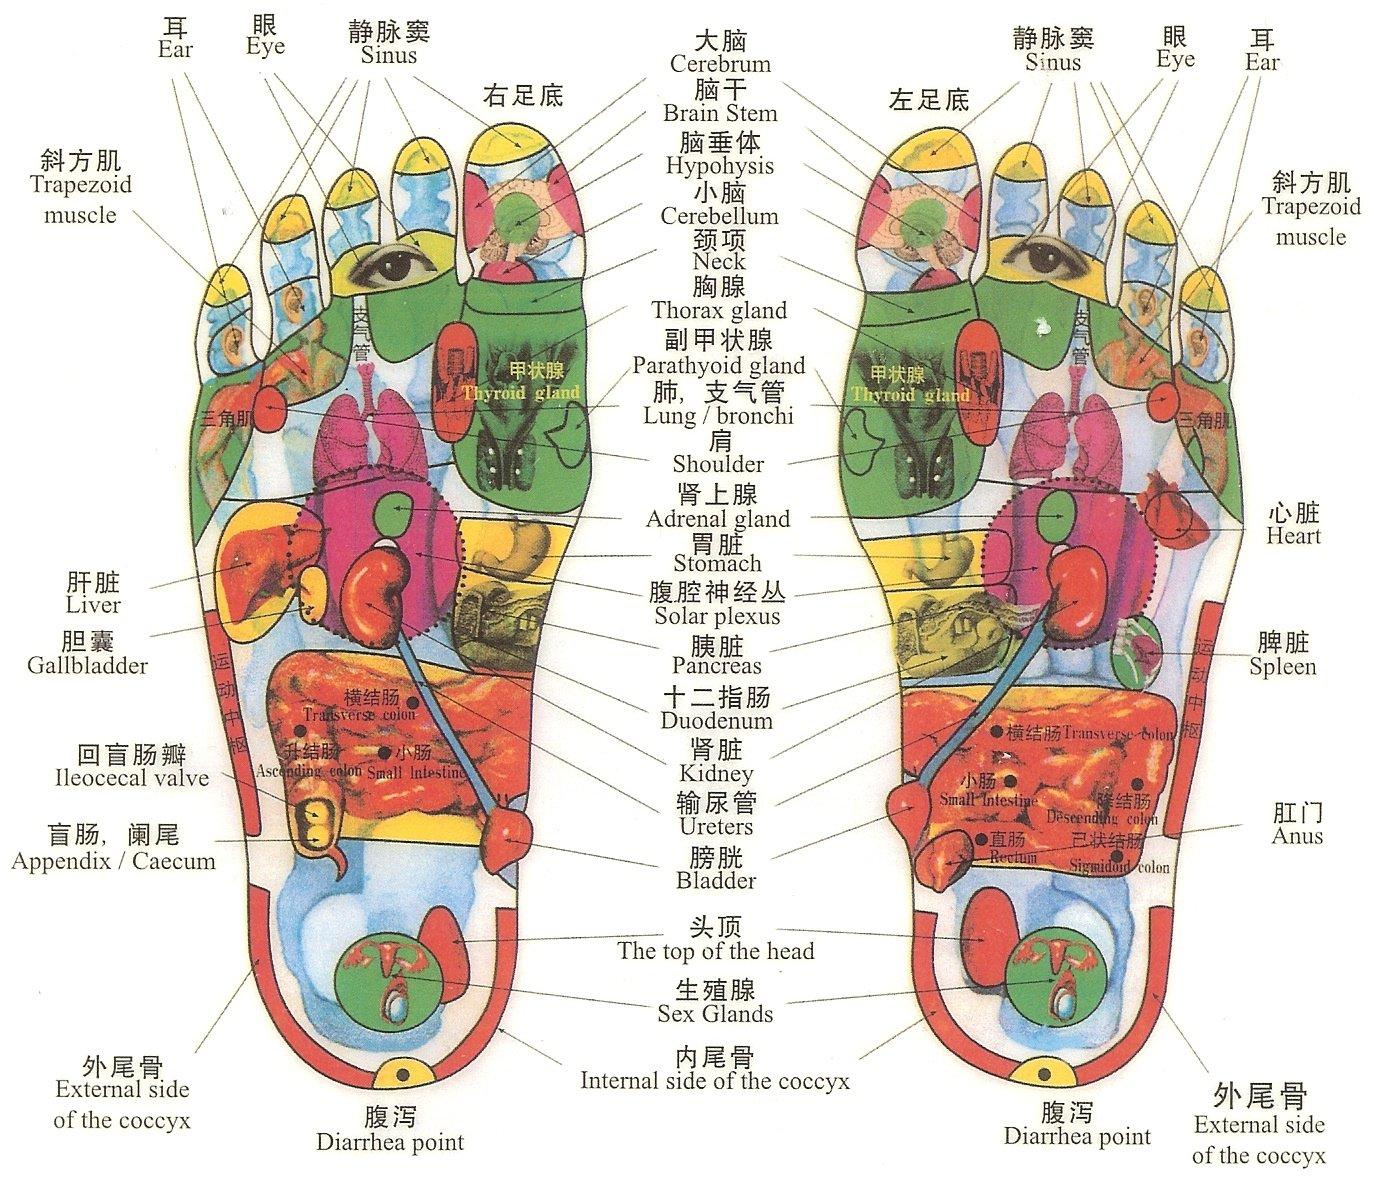 reflexology foot diagram reflex zones whelen 295hfsa1 wiring similarities between and wudhu ablution